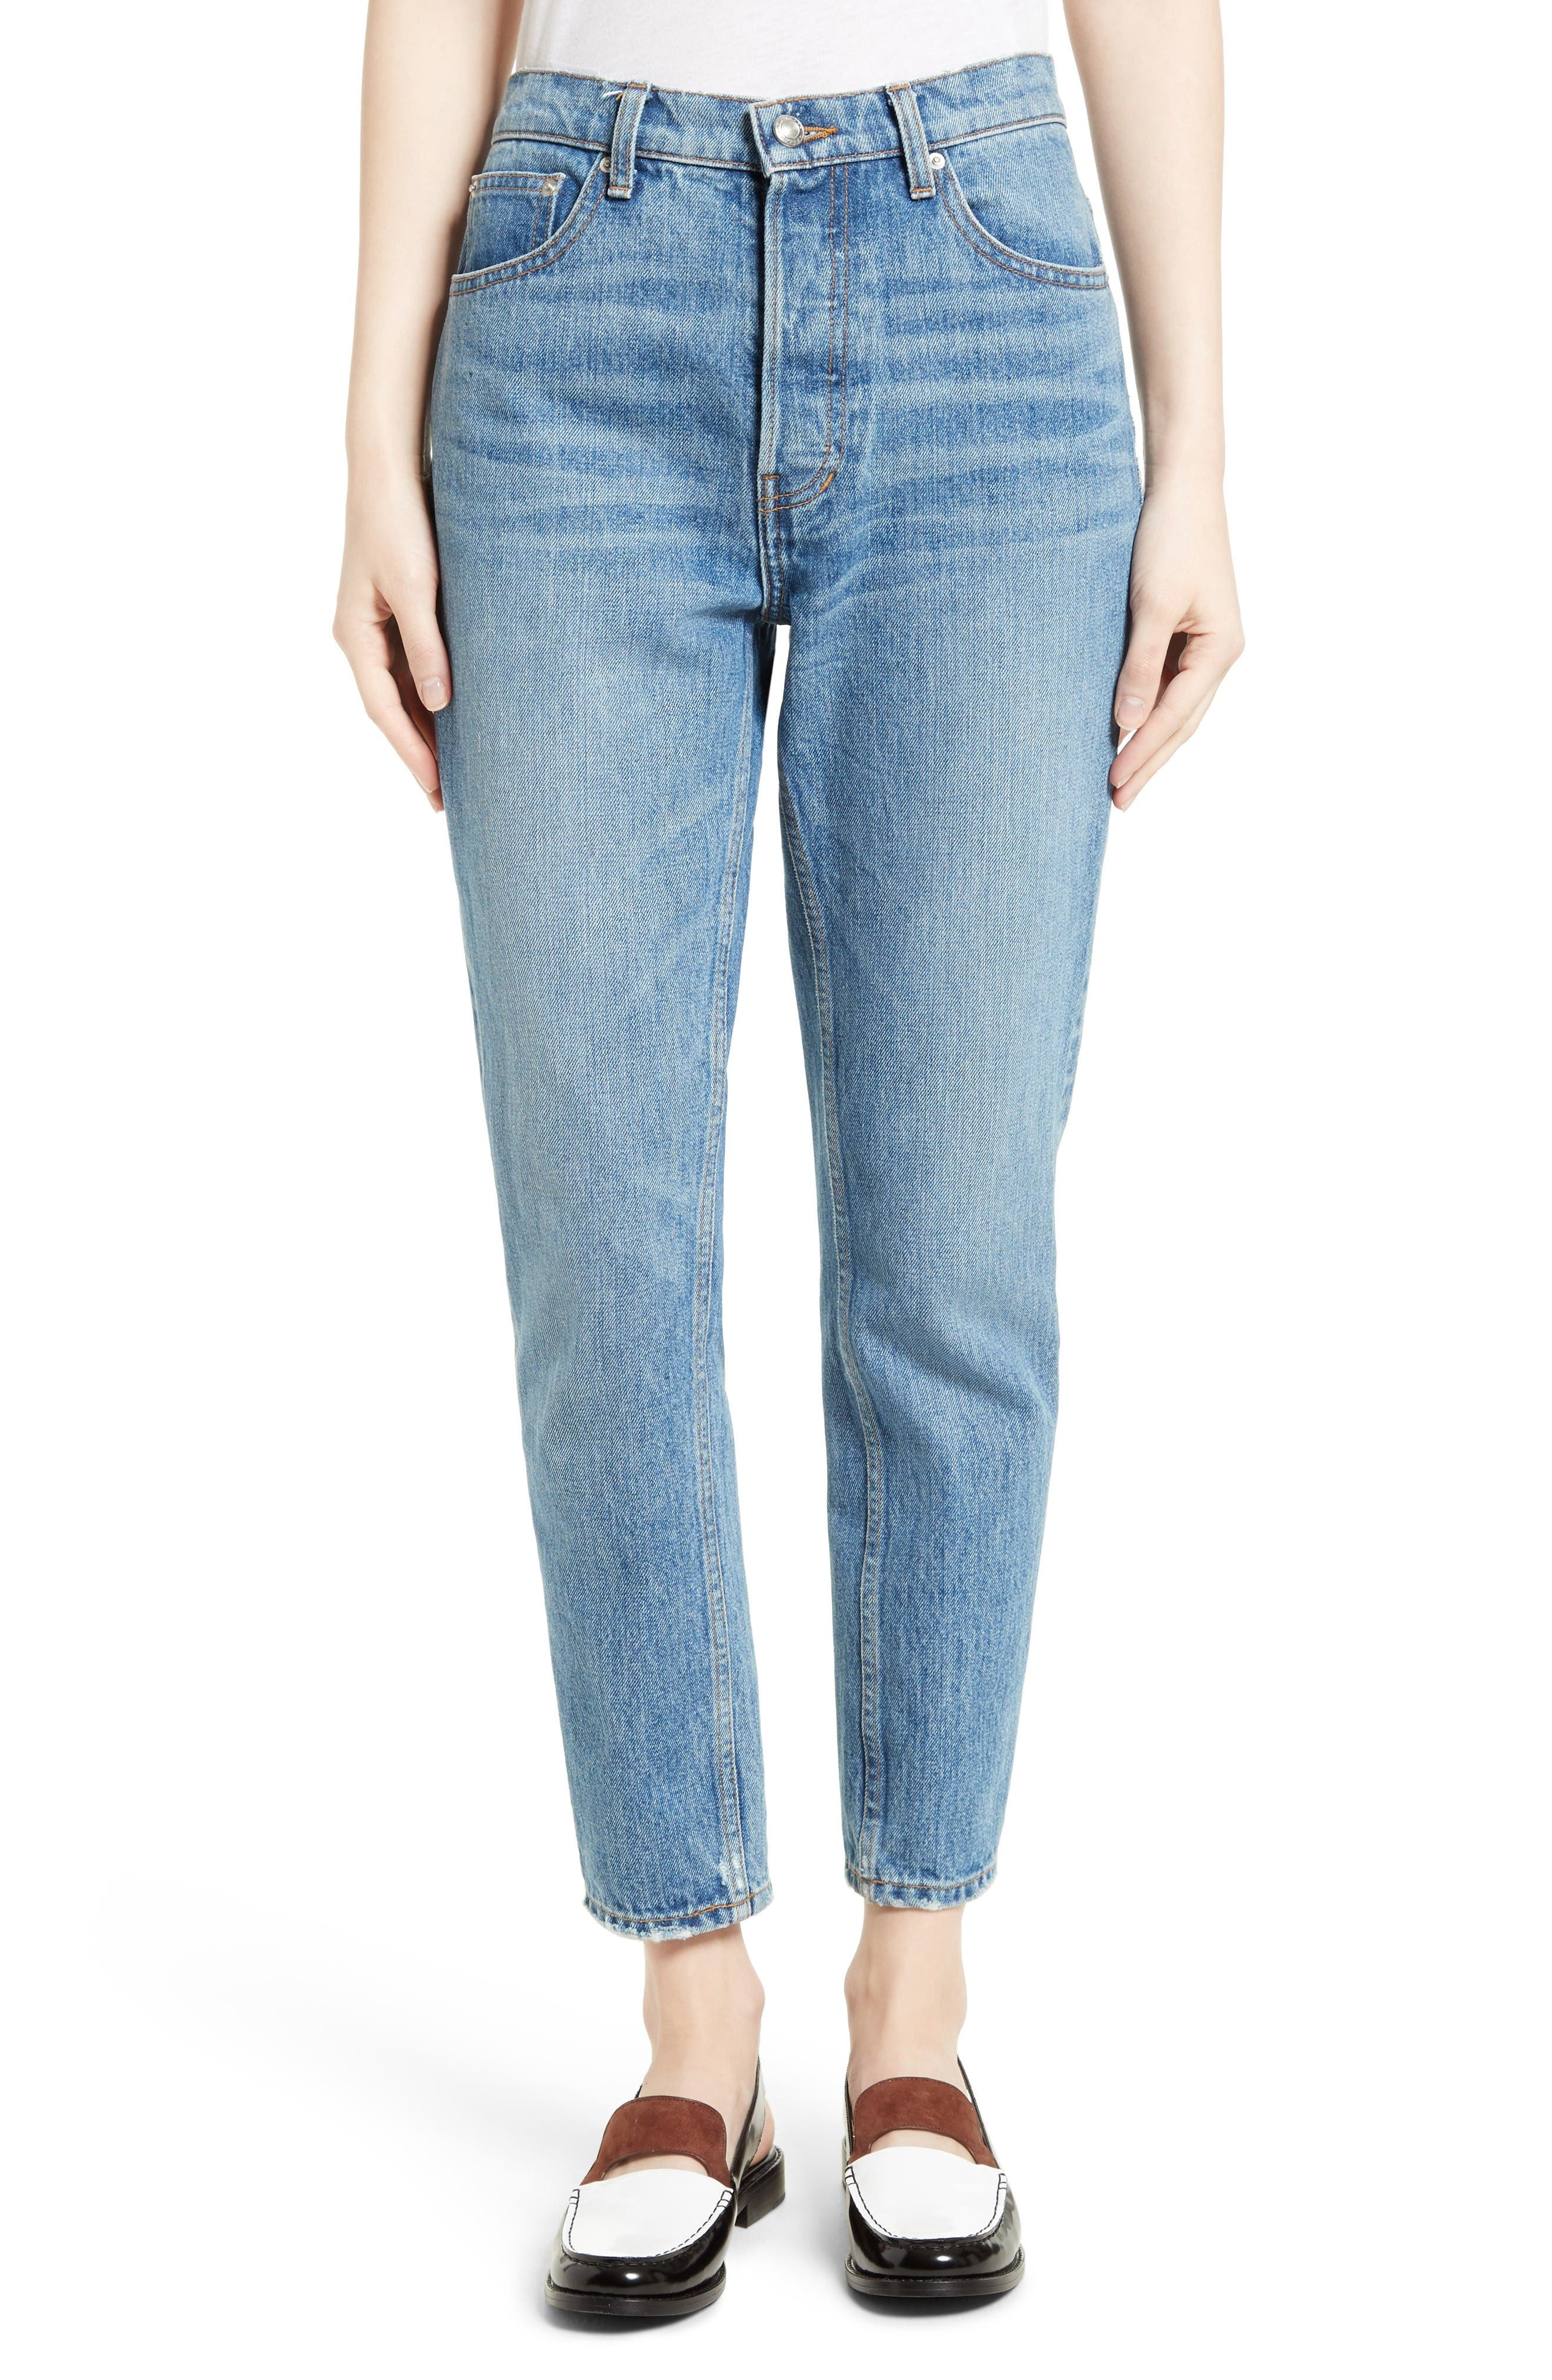 Main Image - Derek Lam 10 Crosby Lou High Waist Jeans